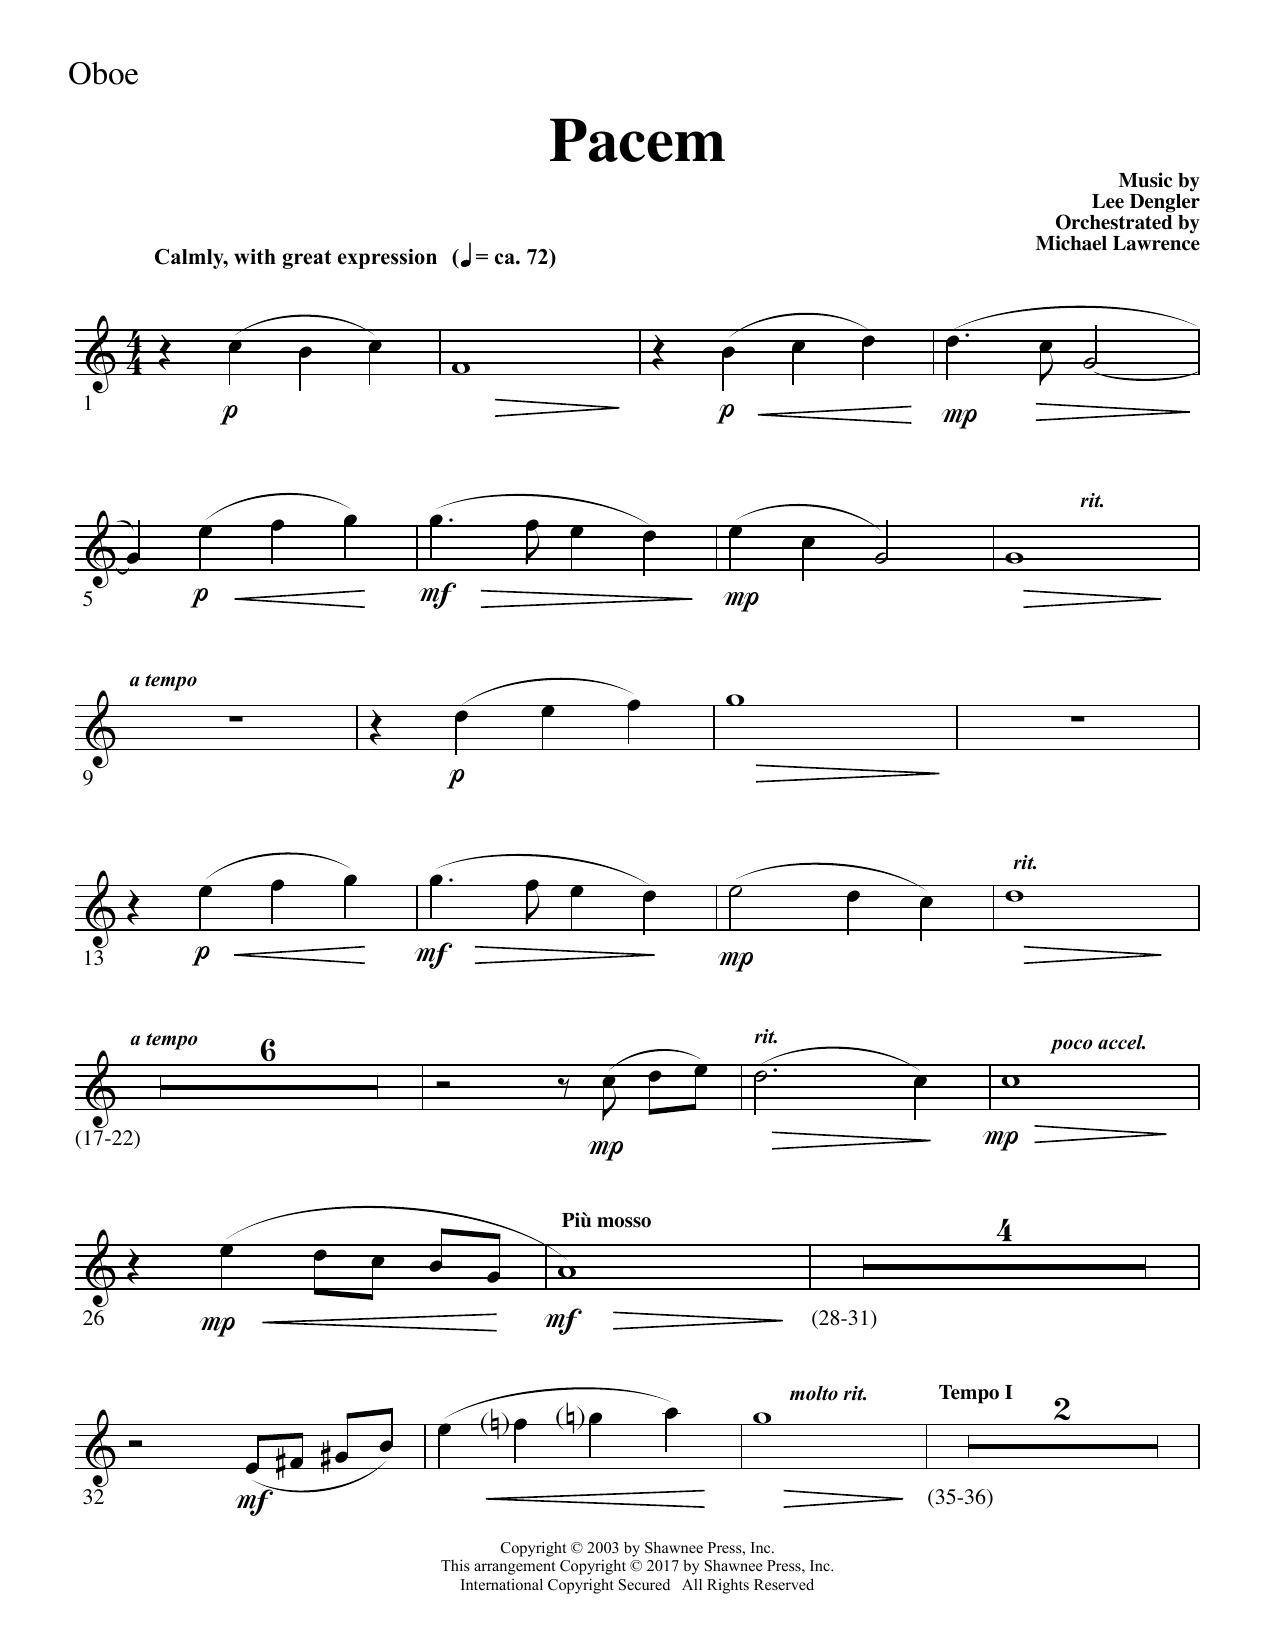 Pacem - Oboe